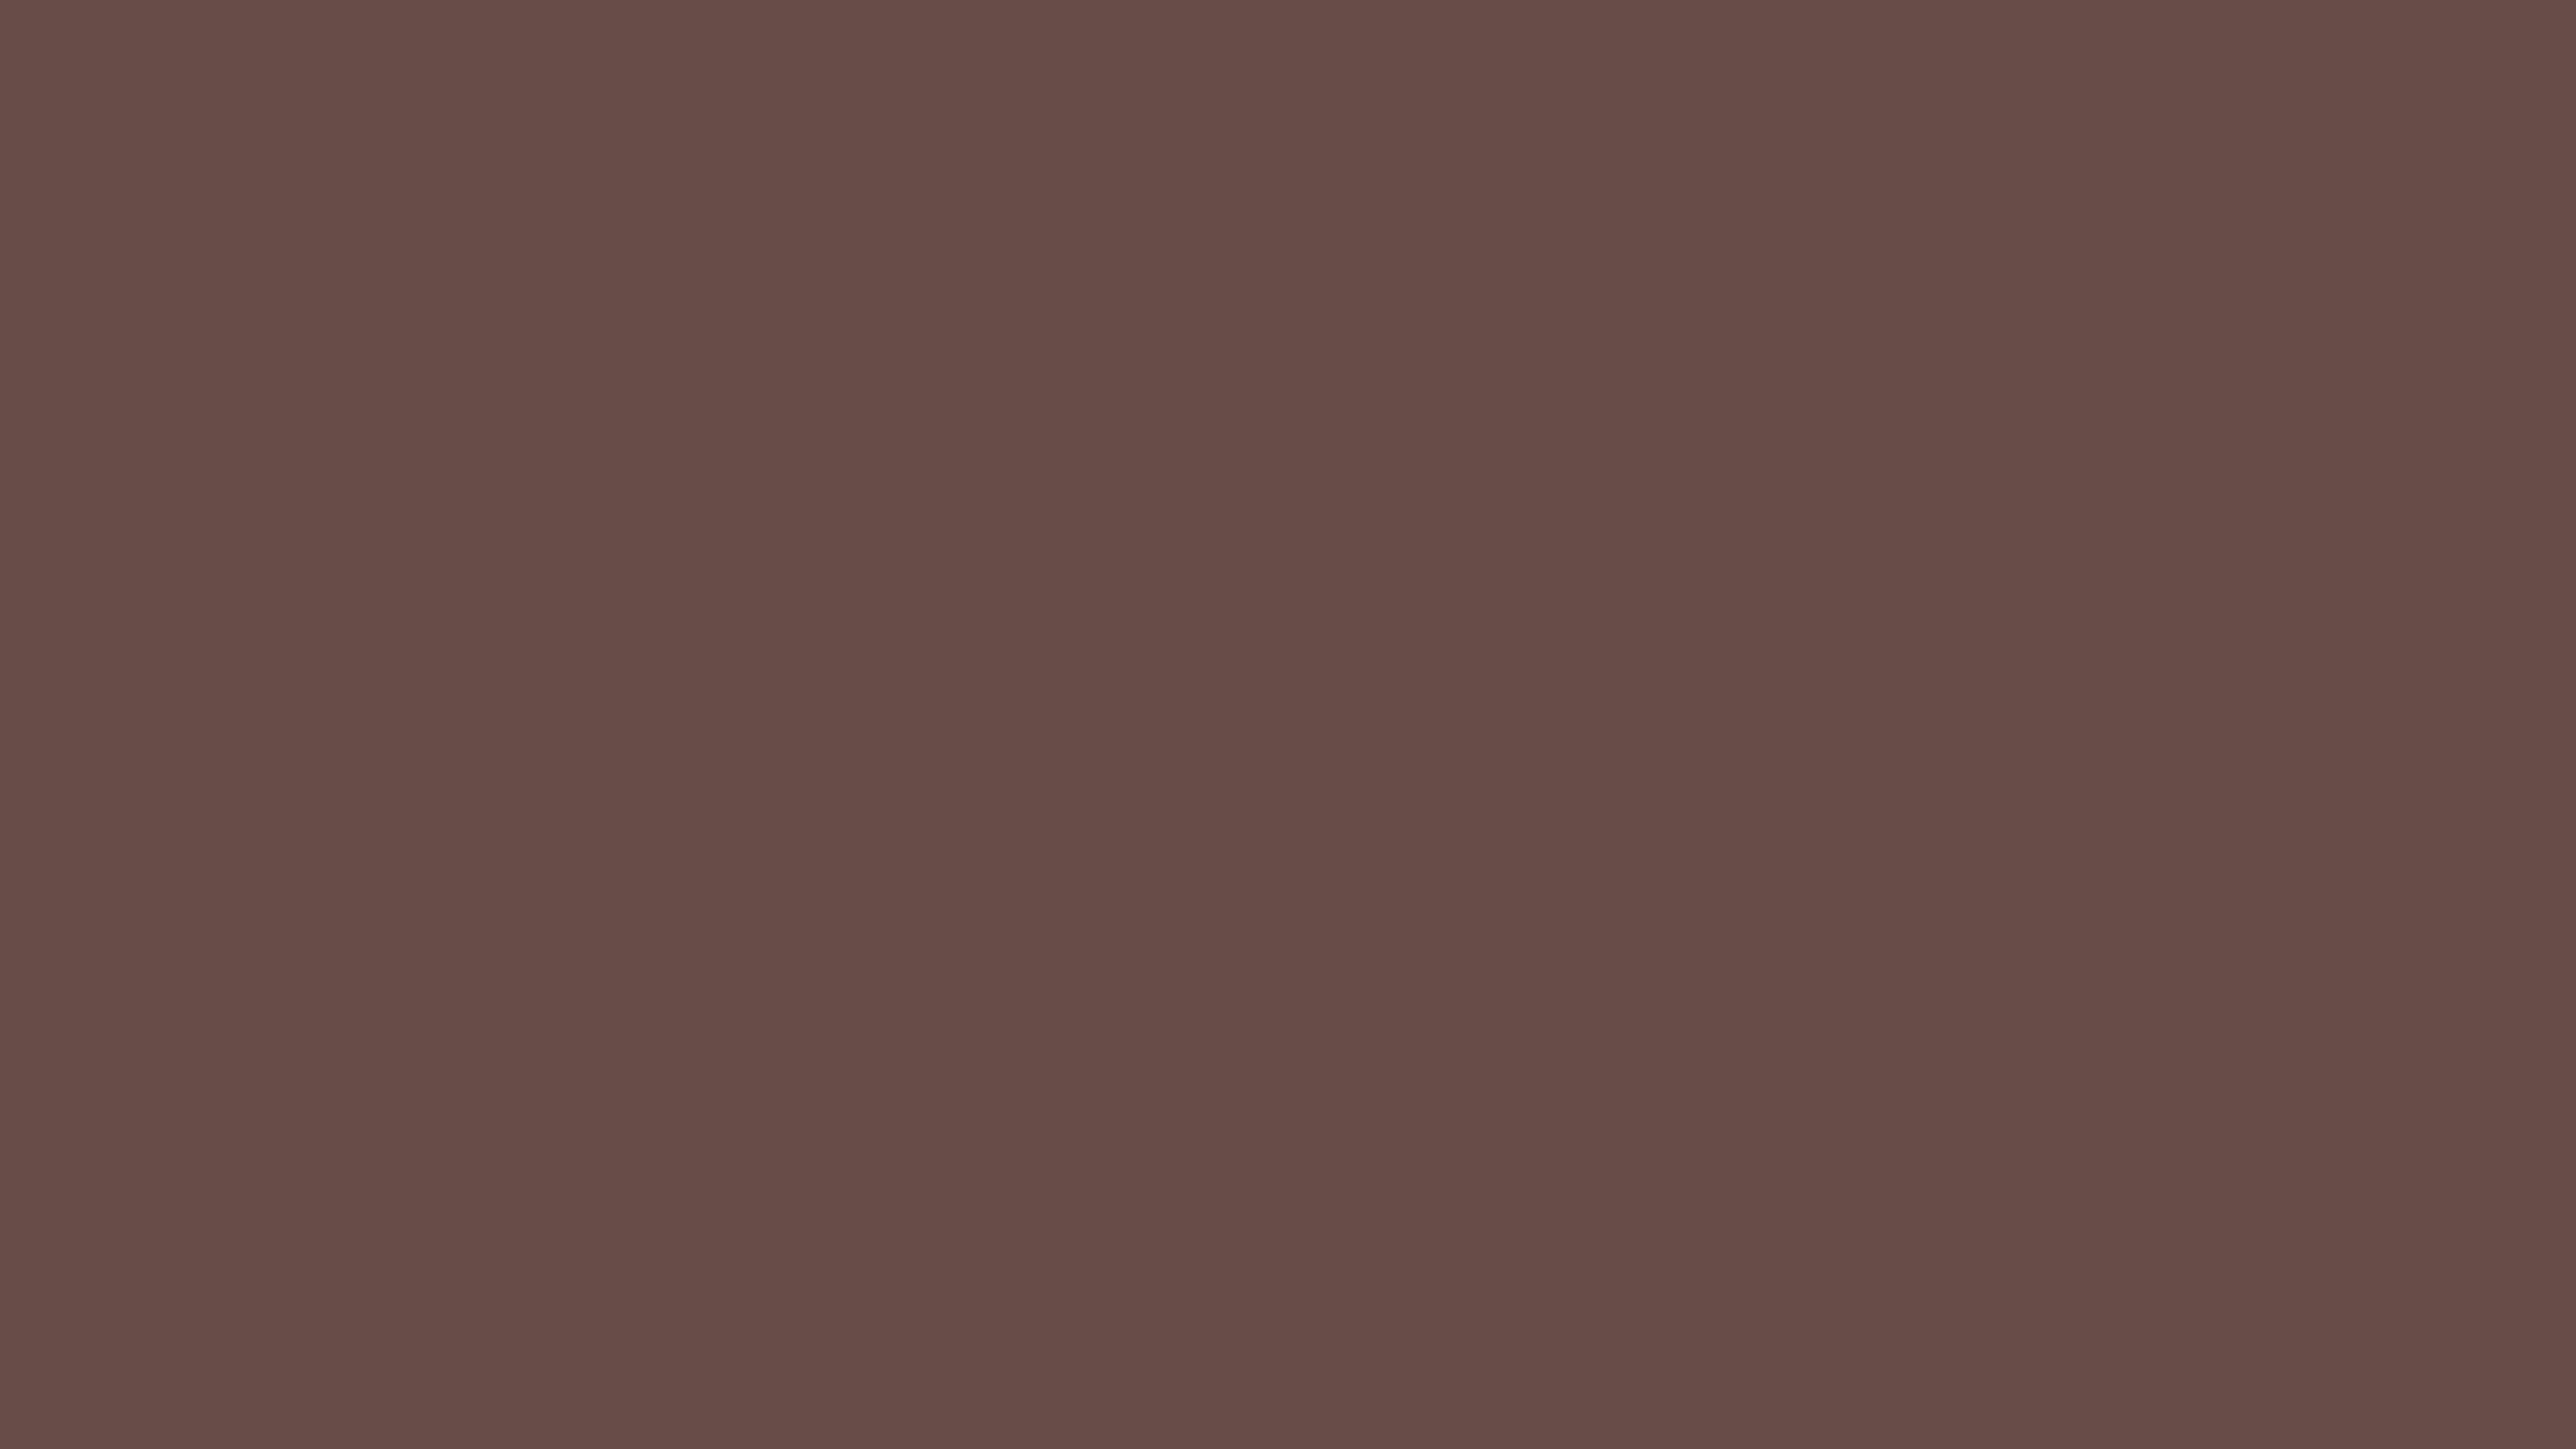 3840x2160 Liver Solid Color Background